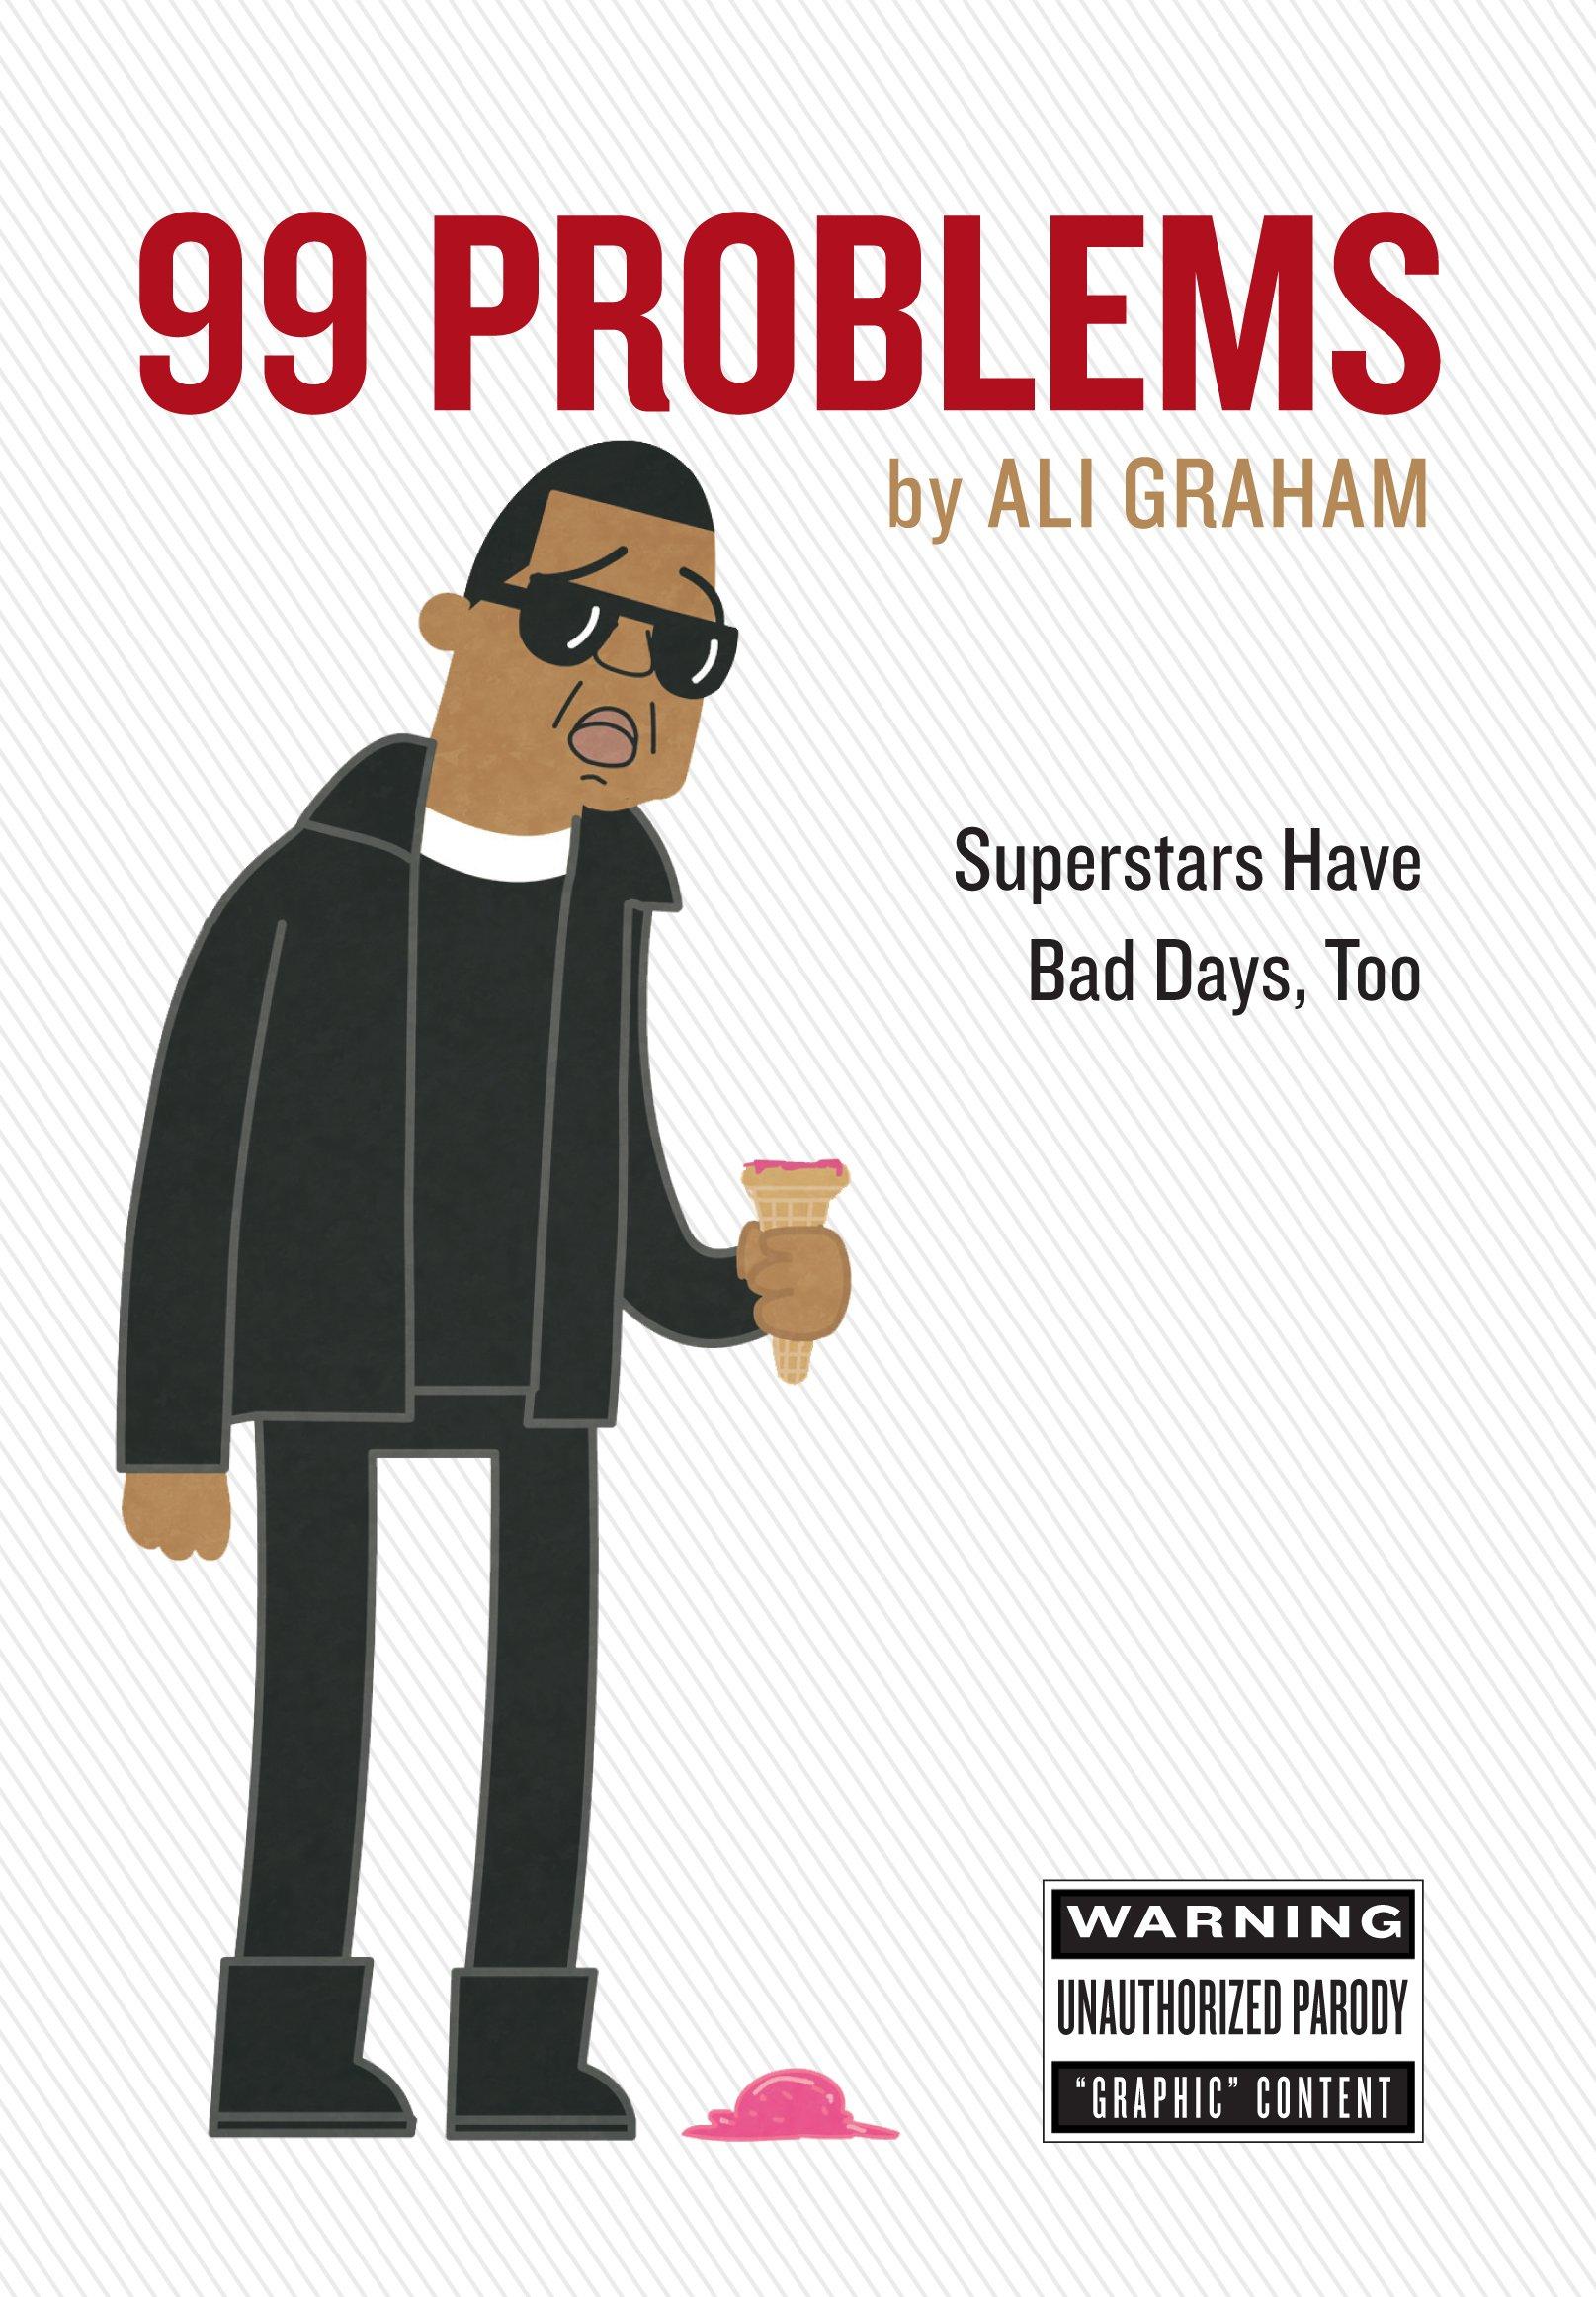 99 Problems: Superstars Have Bad Days, Too